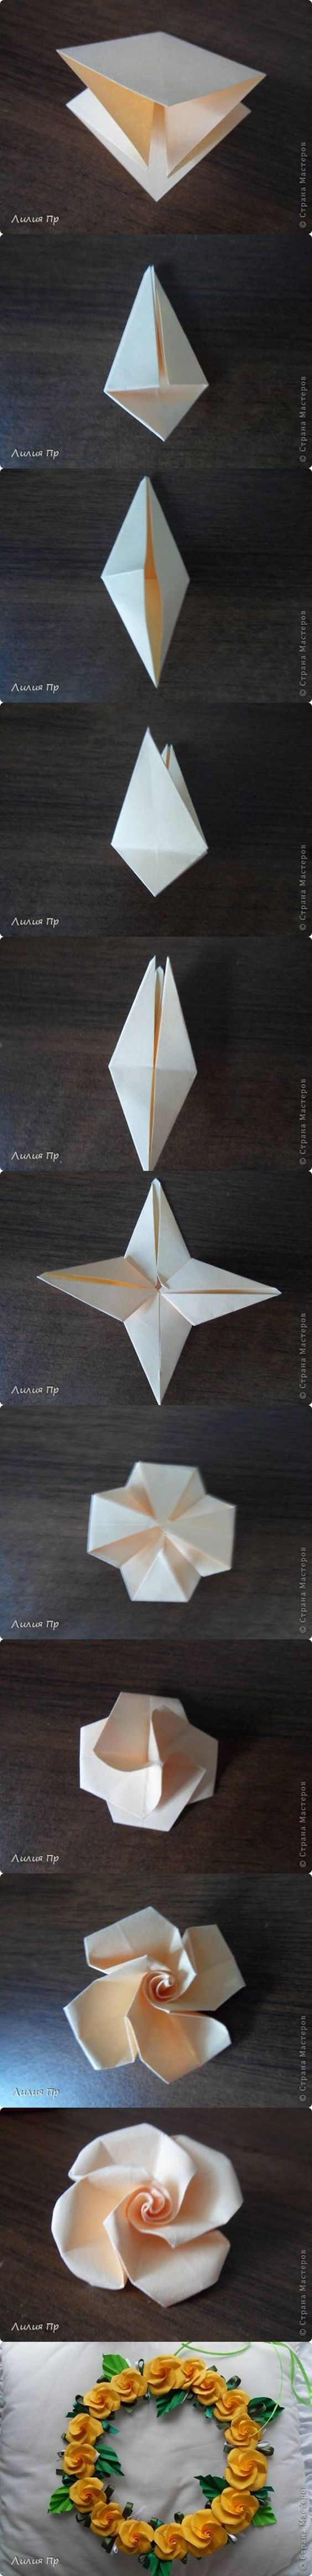 How to DIY Beautiful Origami Rose #craft #Origami